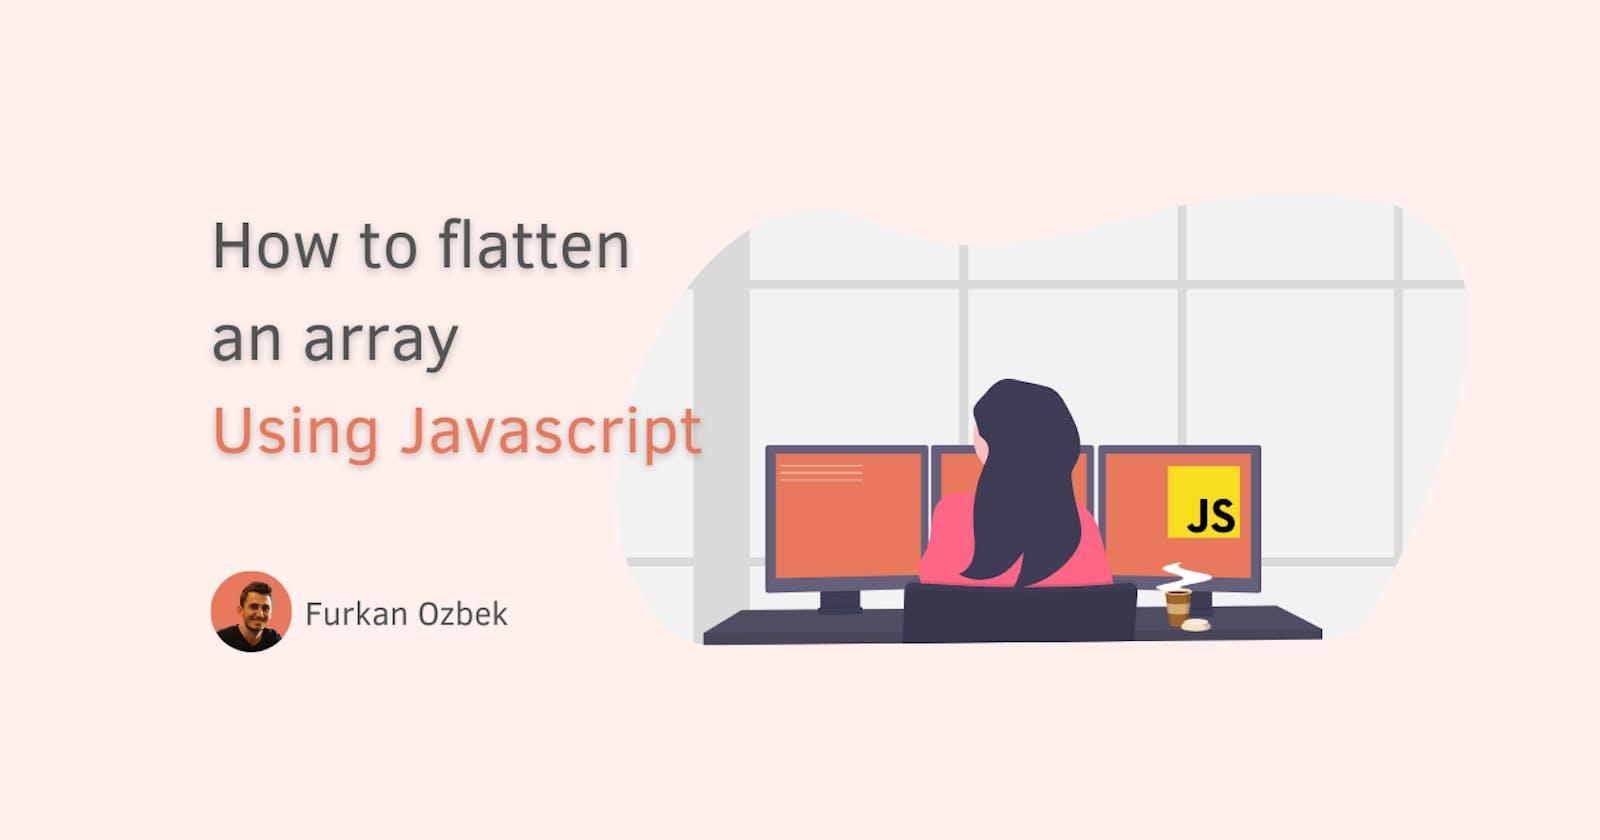 How to flatten array using Javascript